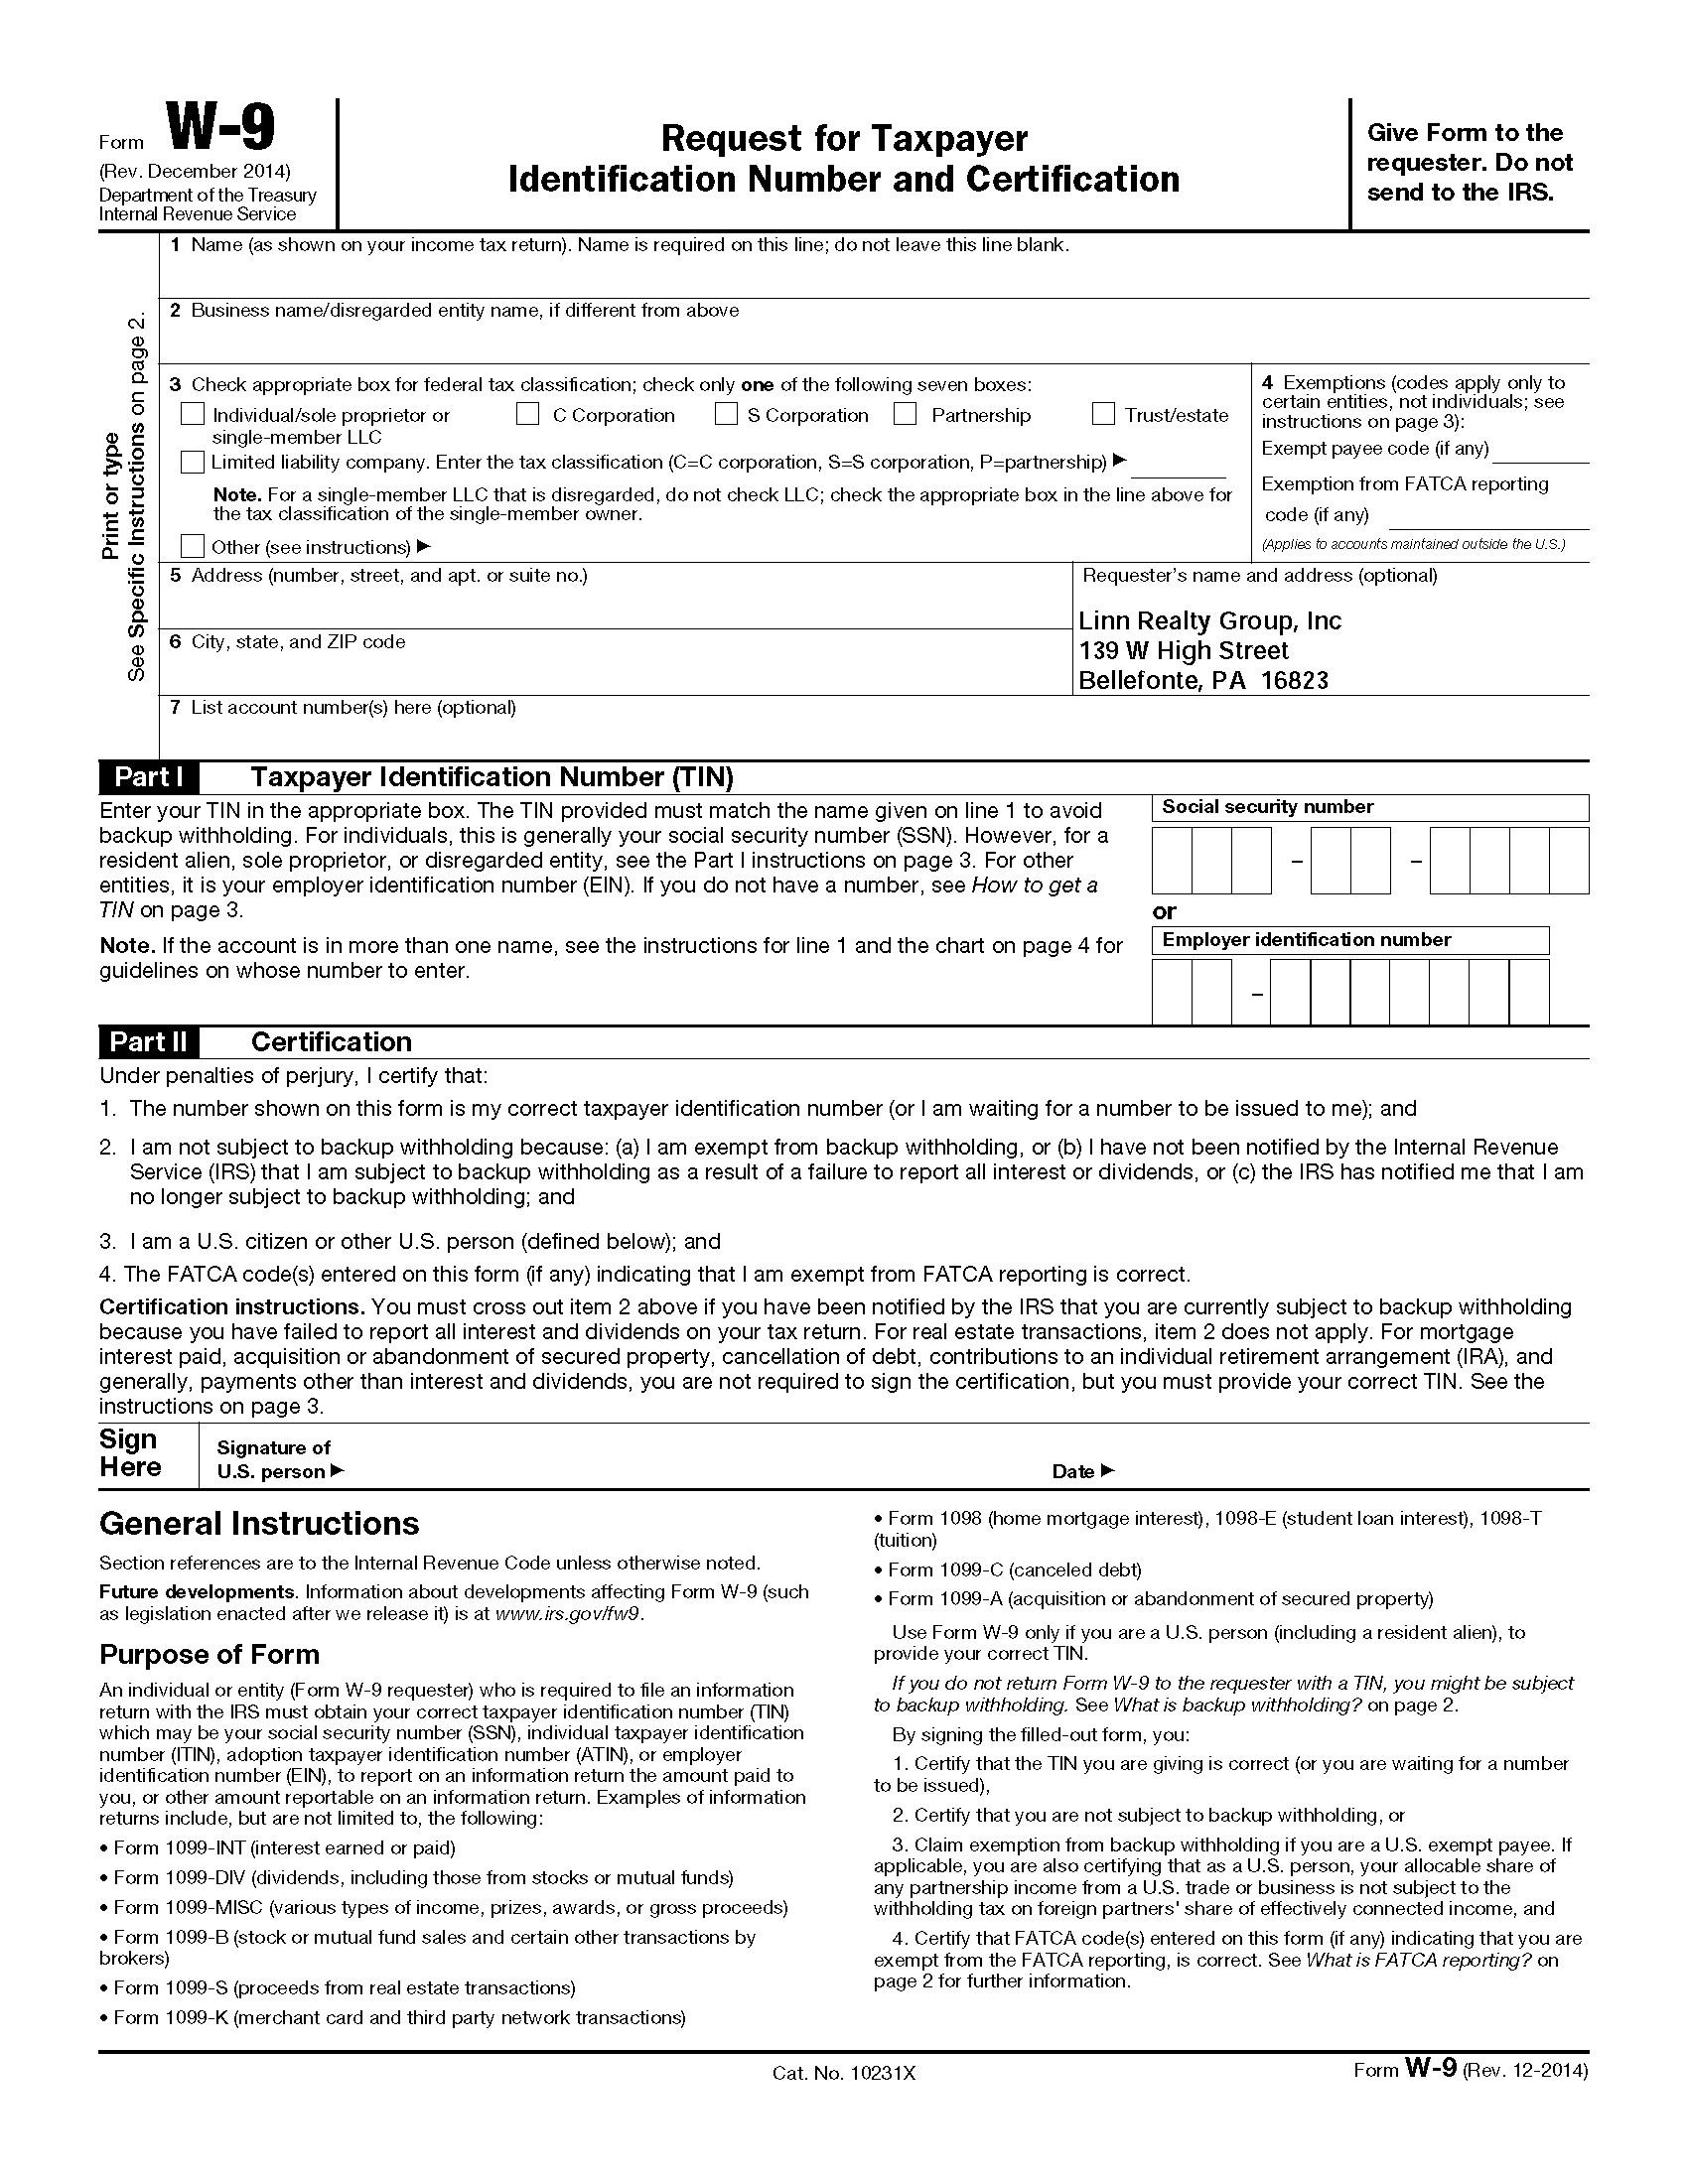 Blank 2019 W 9 Form Printable | Calendar Template Printable-Blank W9 2020 Printable Pdf